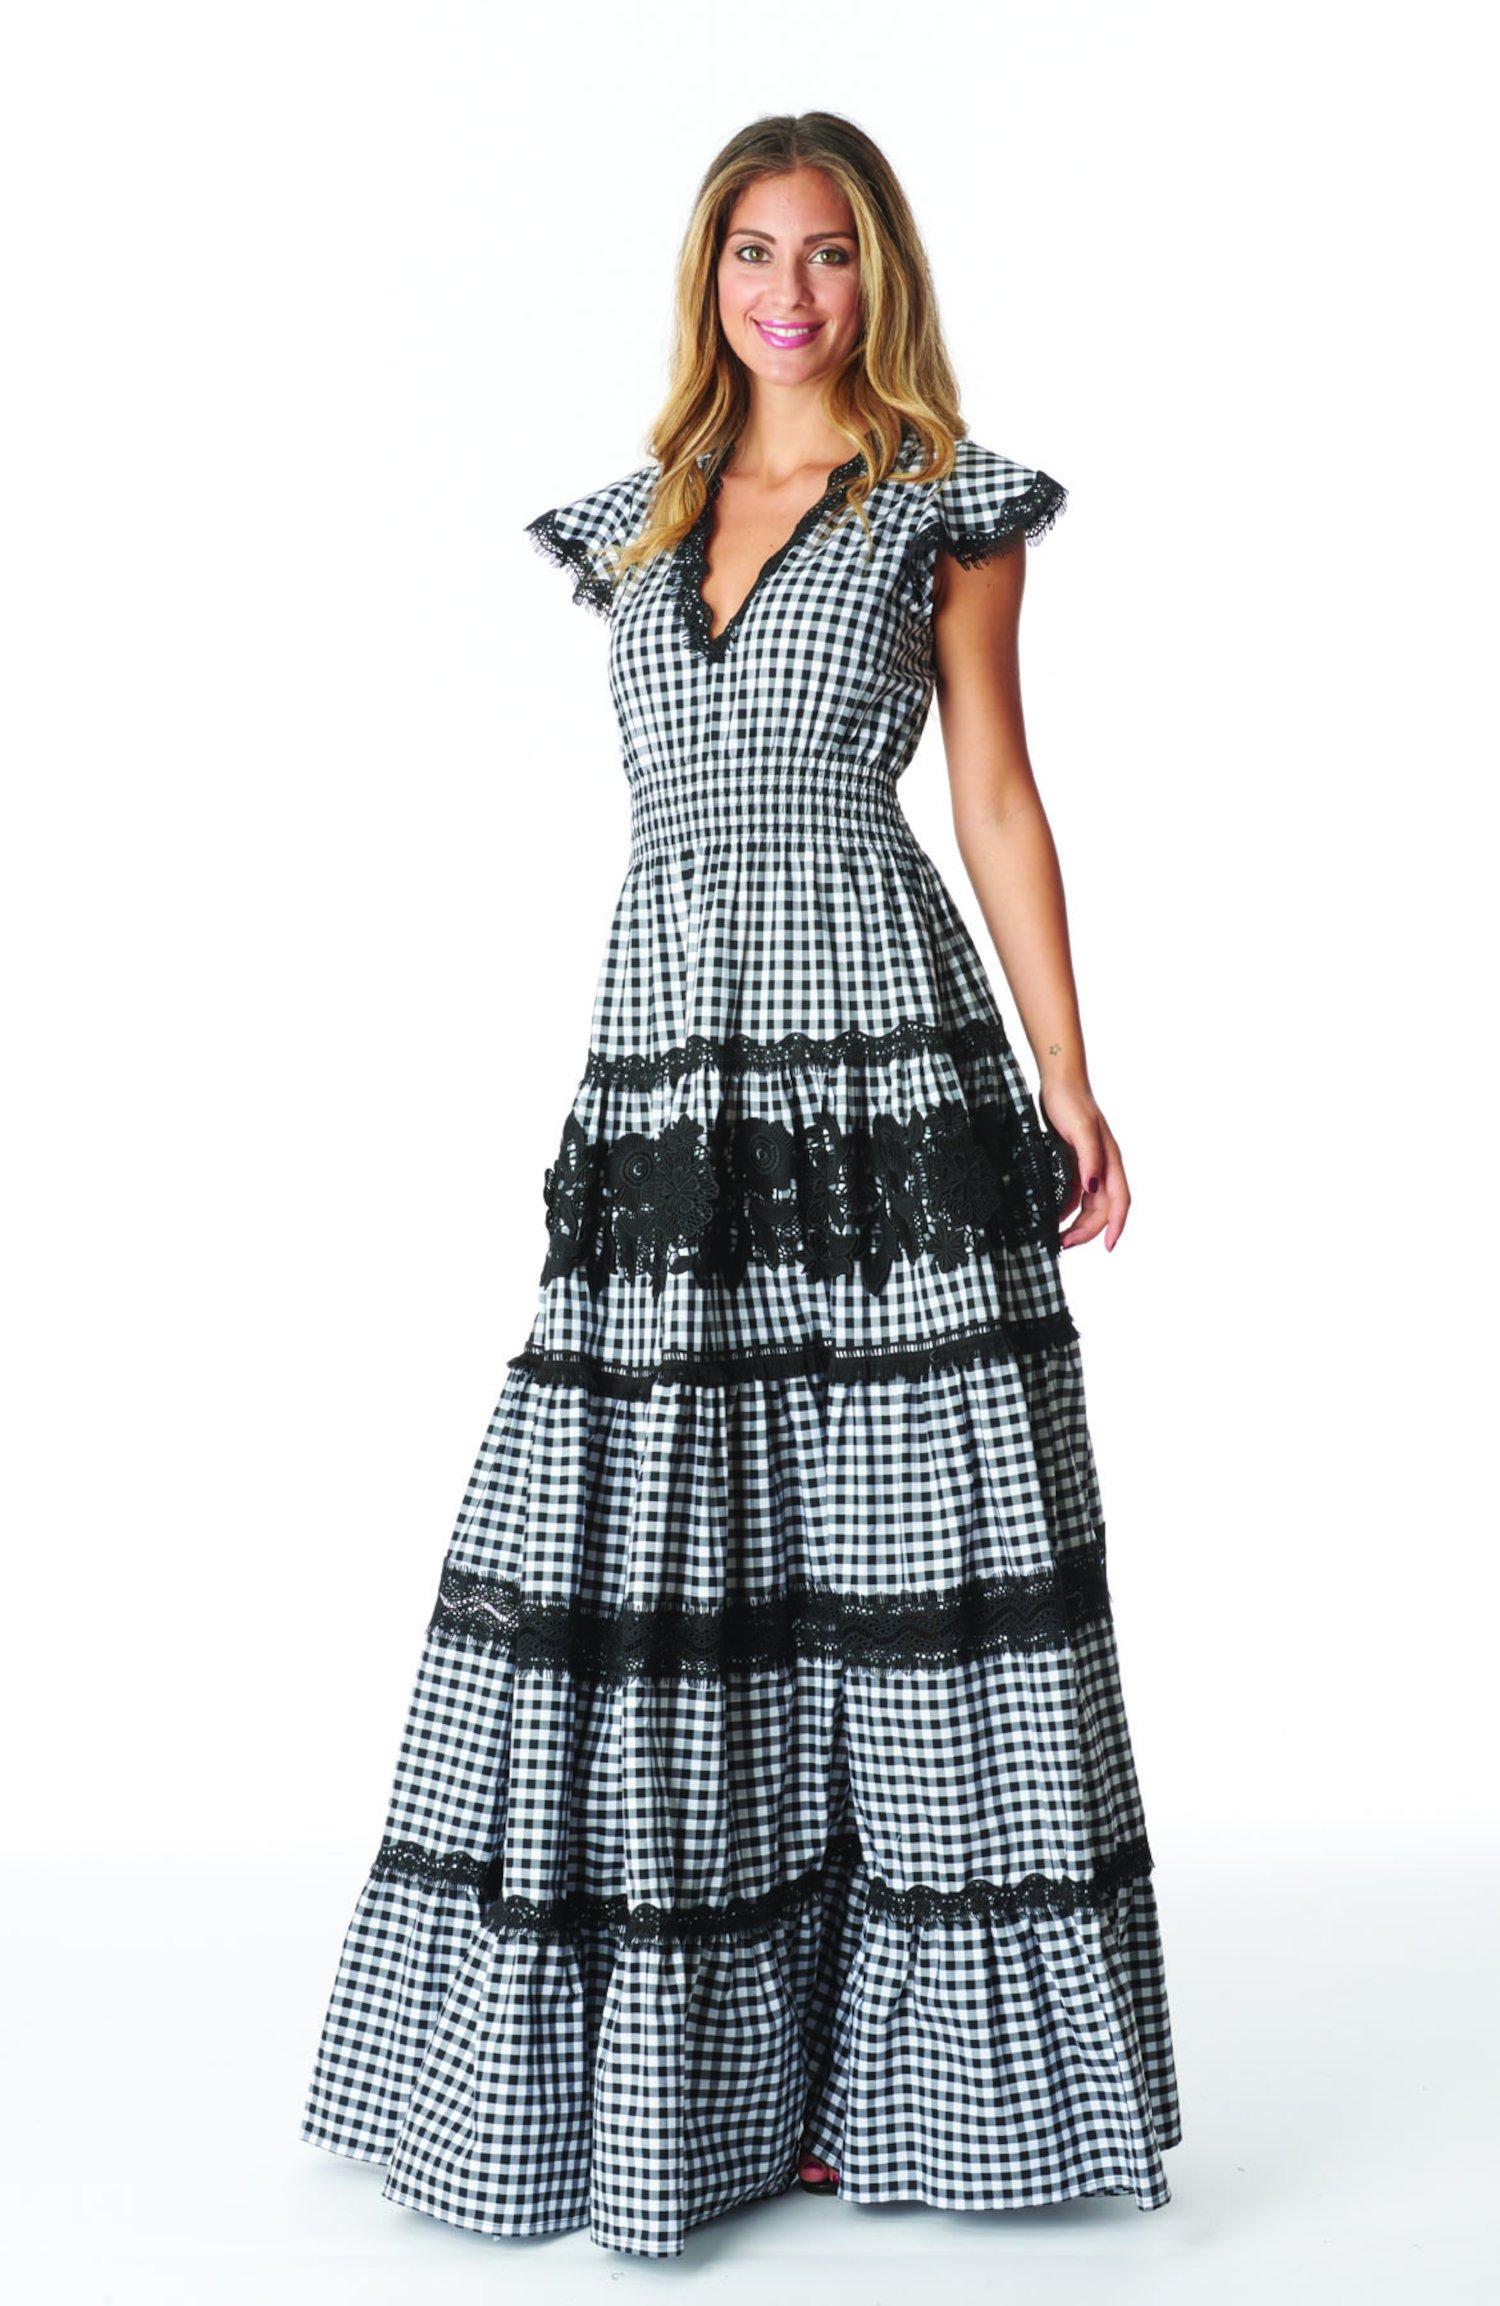 LONG DRESS FLOUNCES VICHY - Vichy Bianco Nero